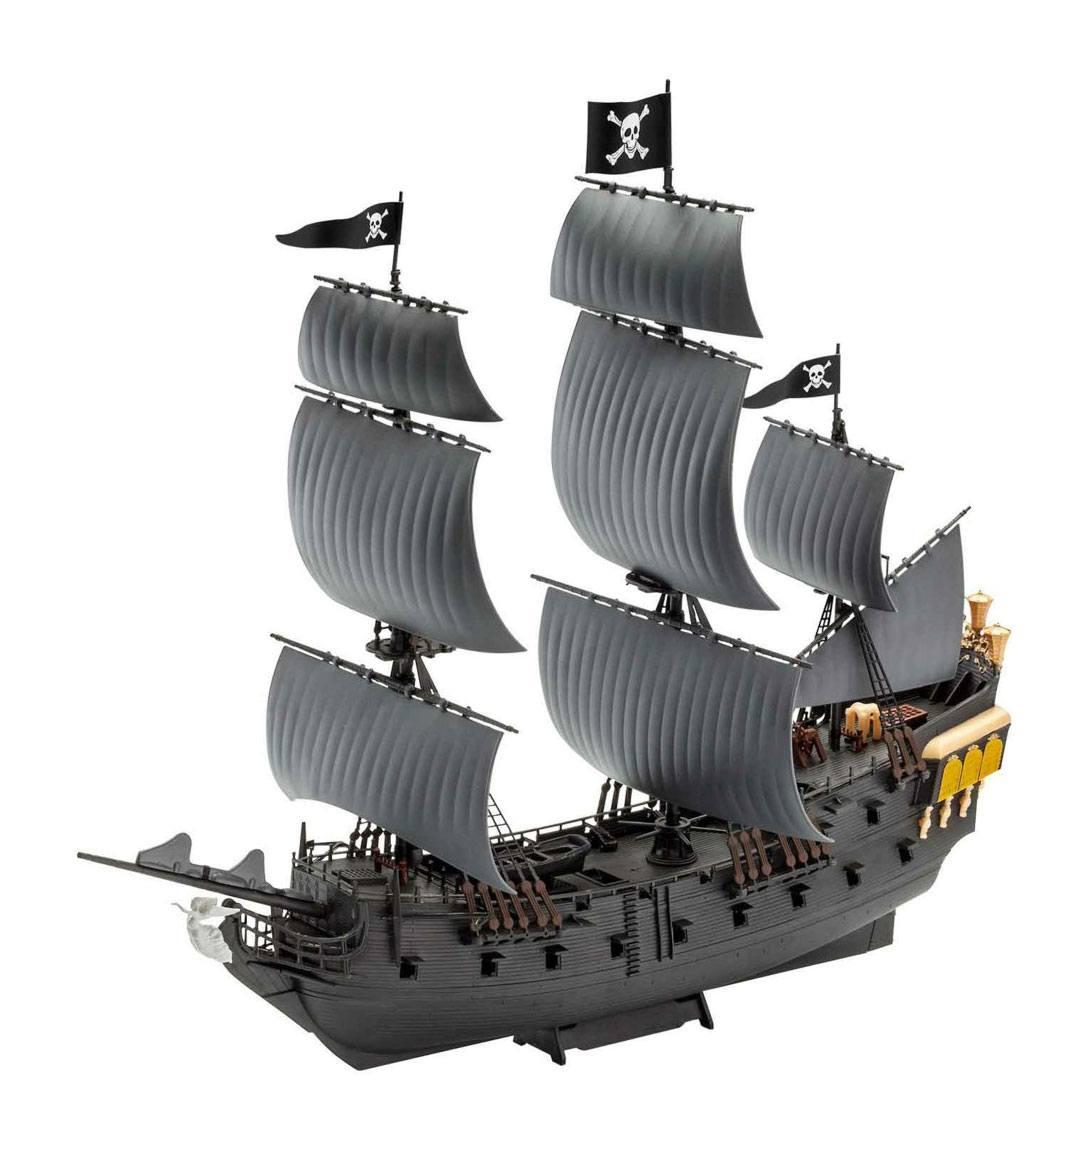 Pirates of the Caribbean Dead Men Tell No Tales Model Kit 1/150 Black Pearl 26 cm